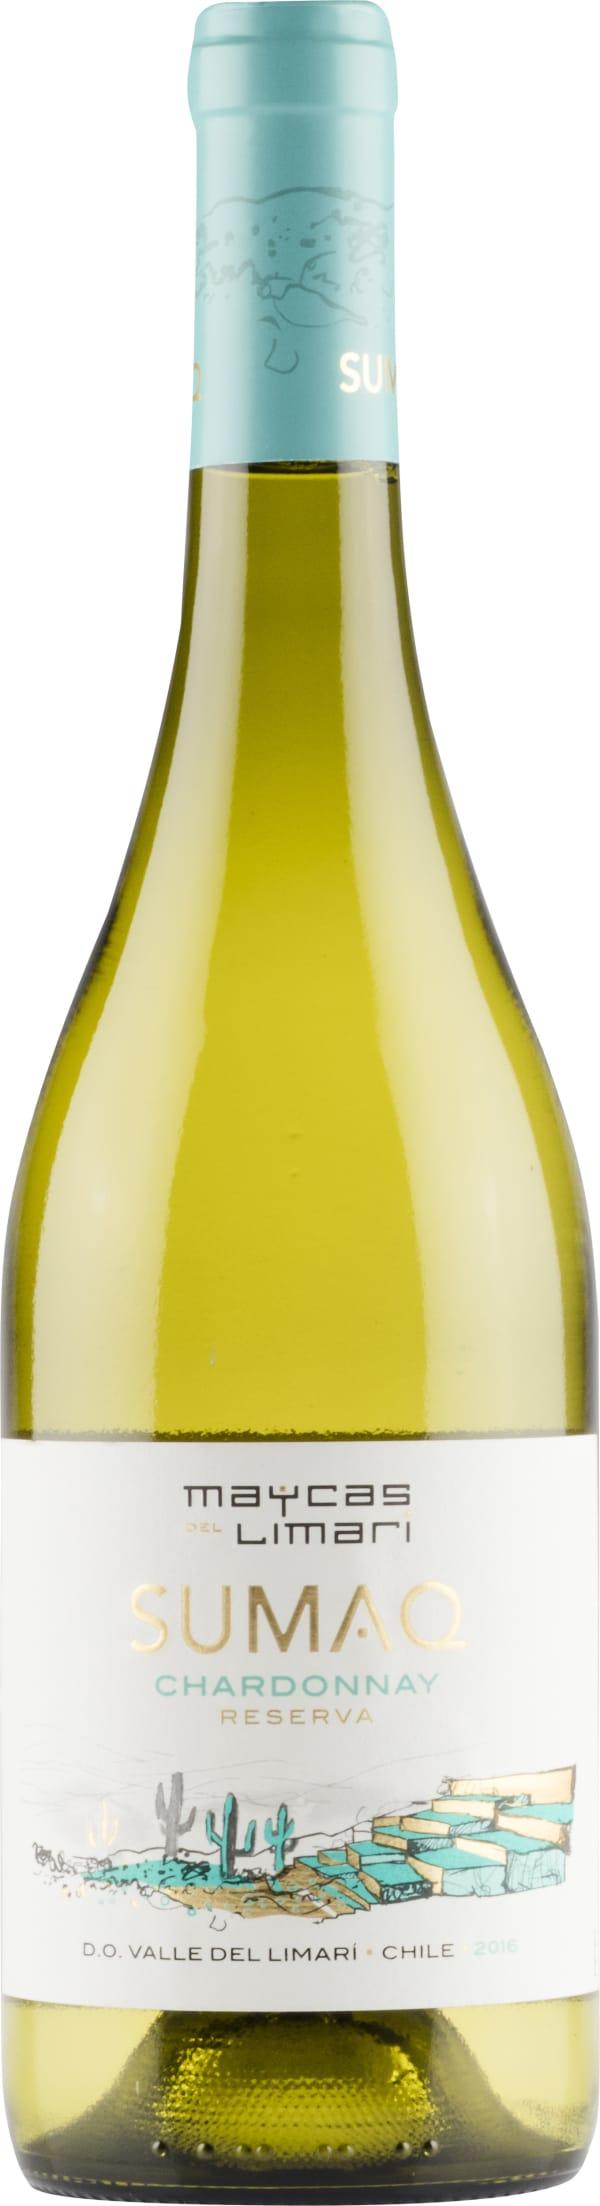 Maycas del Limarí Sumaq Chardonnay 2016